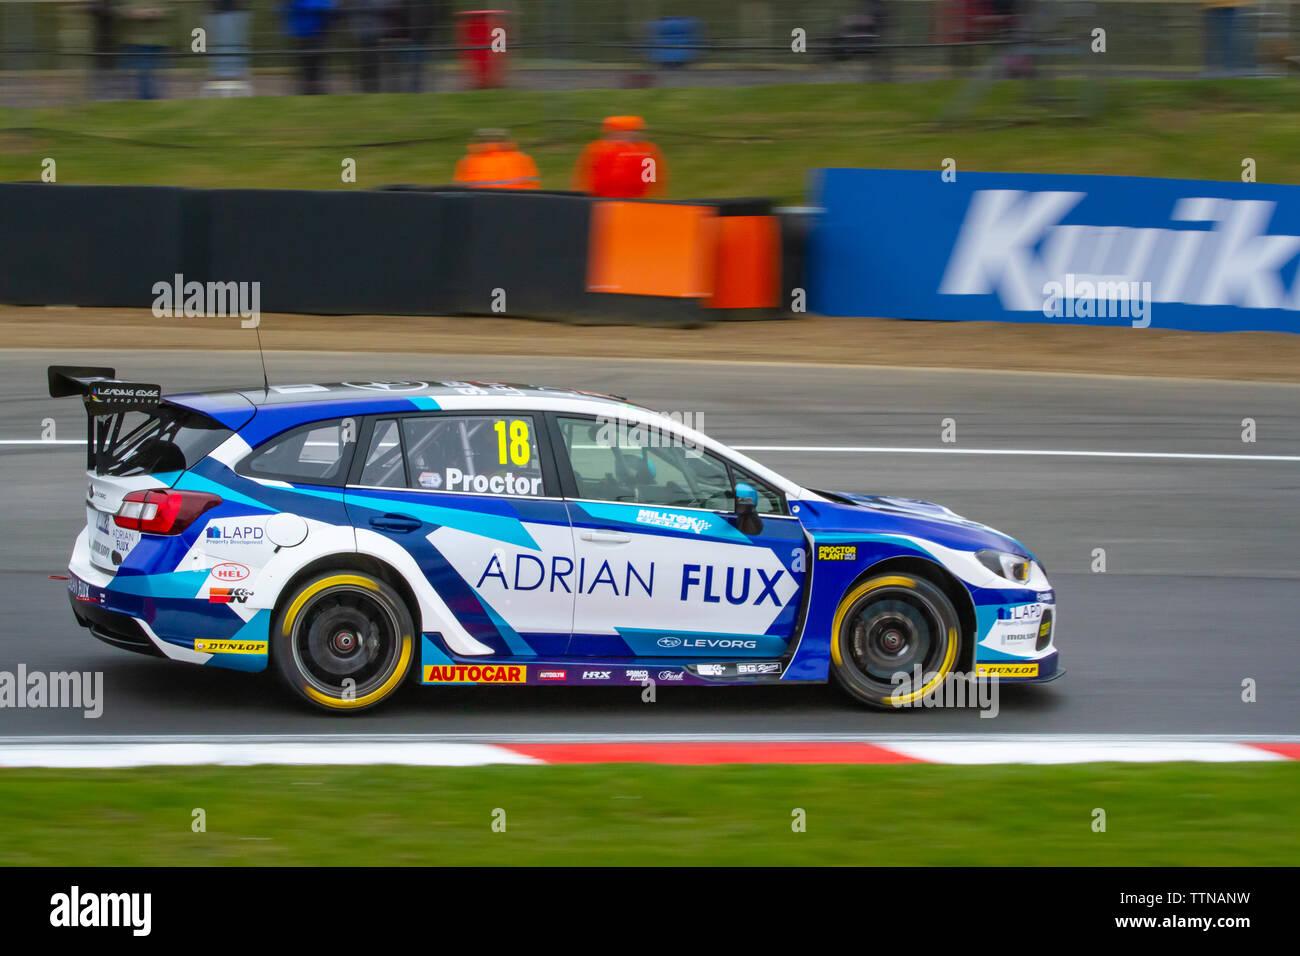 Subaru Levorg on track, British Touring Car Championship (BTCC), Brands Hatch, first race weekend of the season, April 2019 - Stock Image